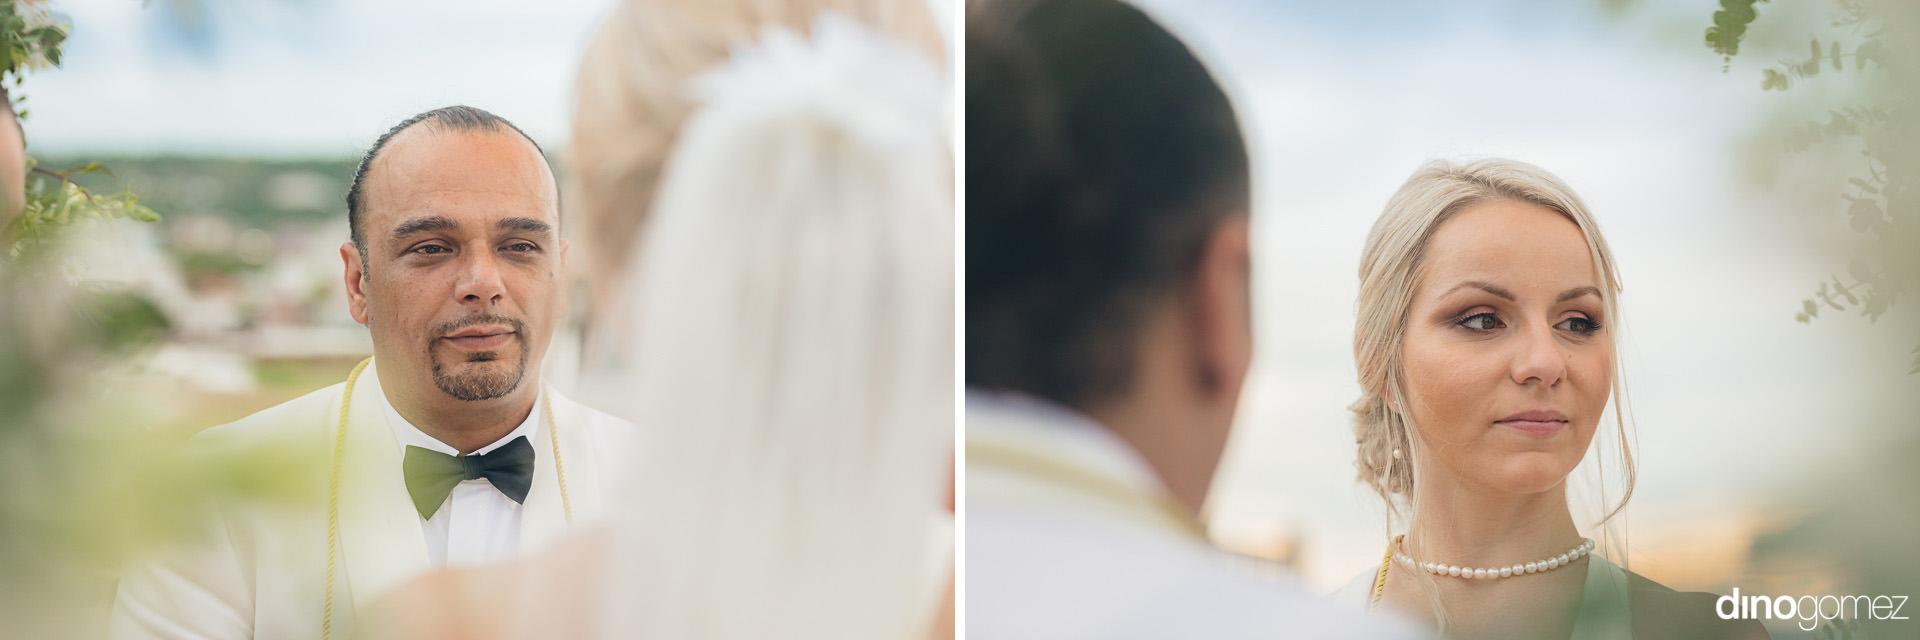 Emotive Wedding Ceremony At The Conrad Cartagena - St